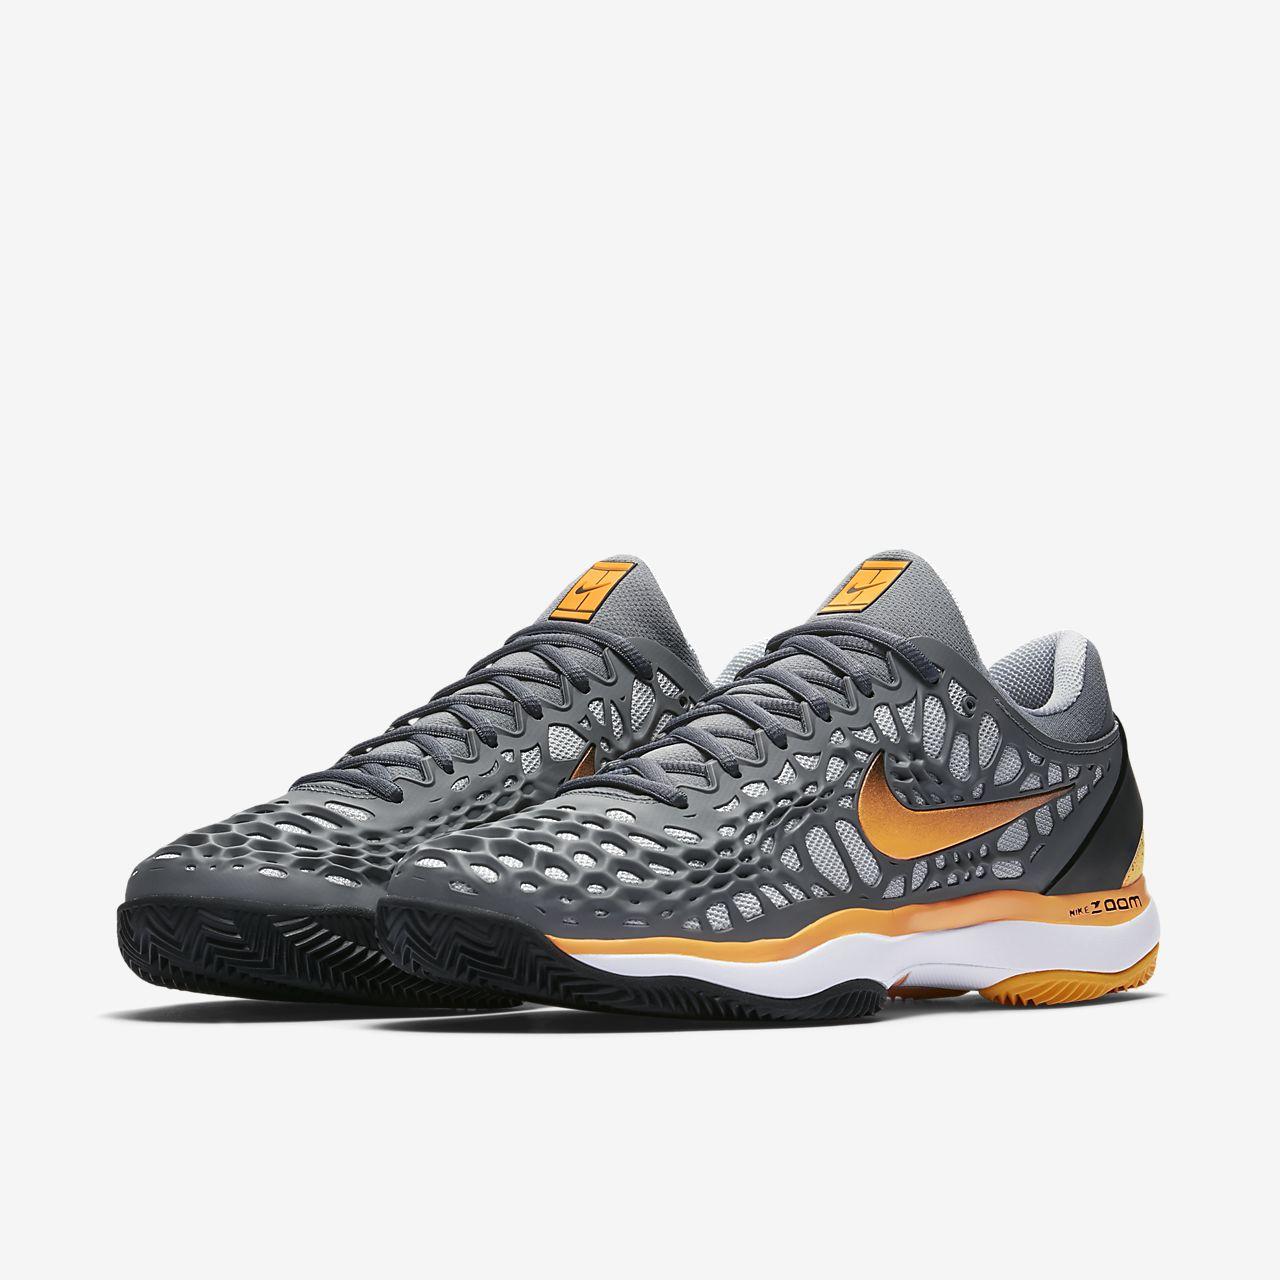 ... Nike Zoom Cage 3 Clay Men's Tennis Shoe